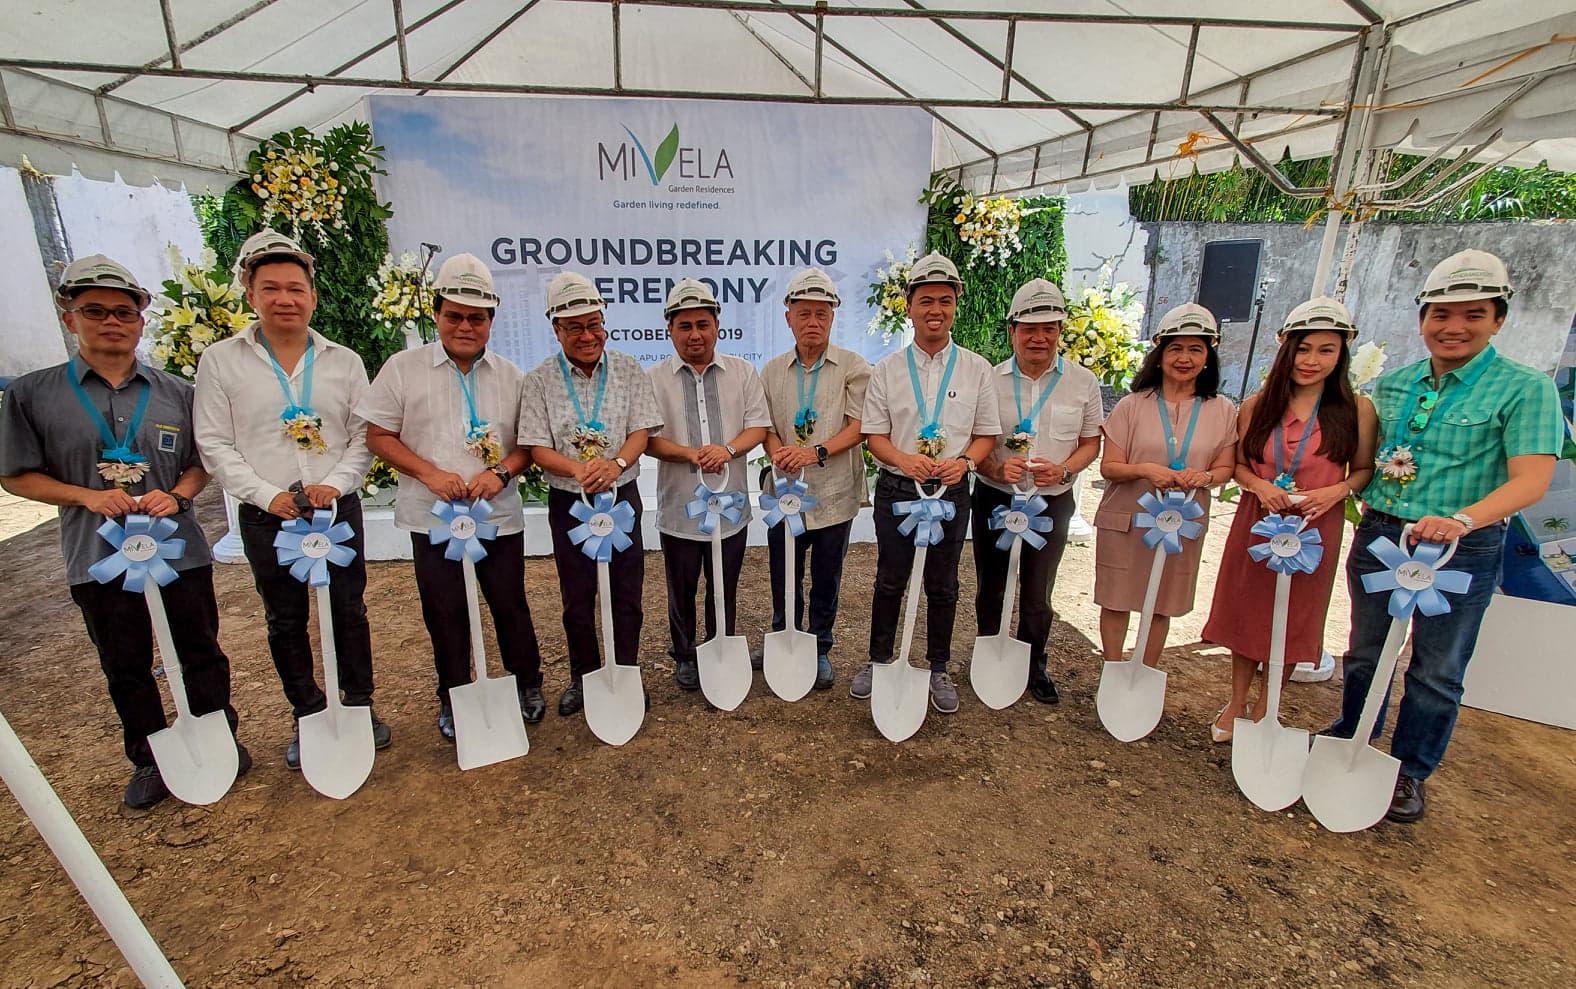 Cebu Landmasters Mivela Garden Residences Groundbreaking